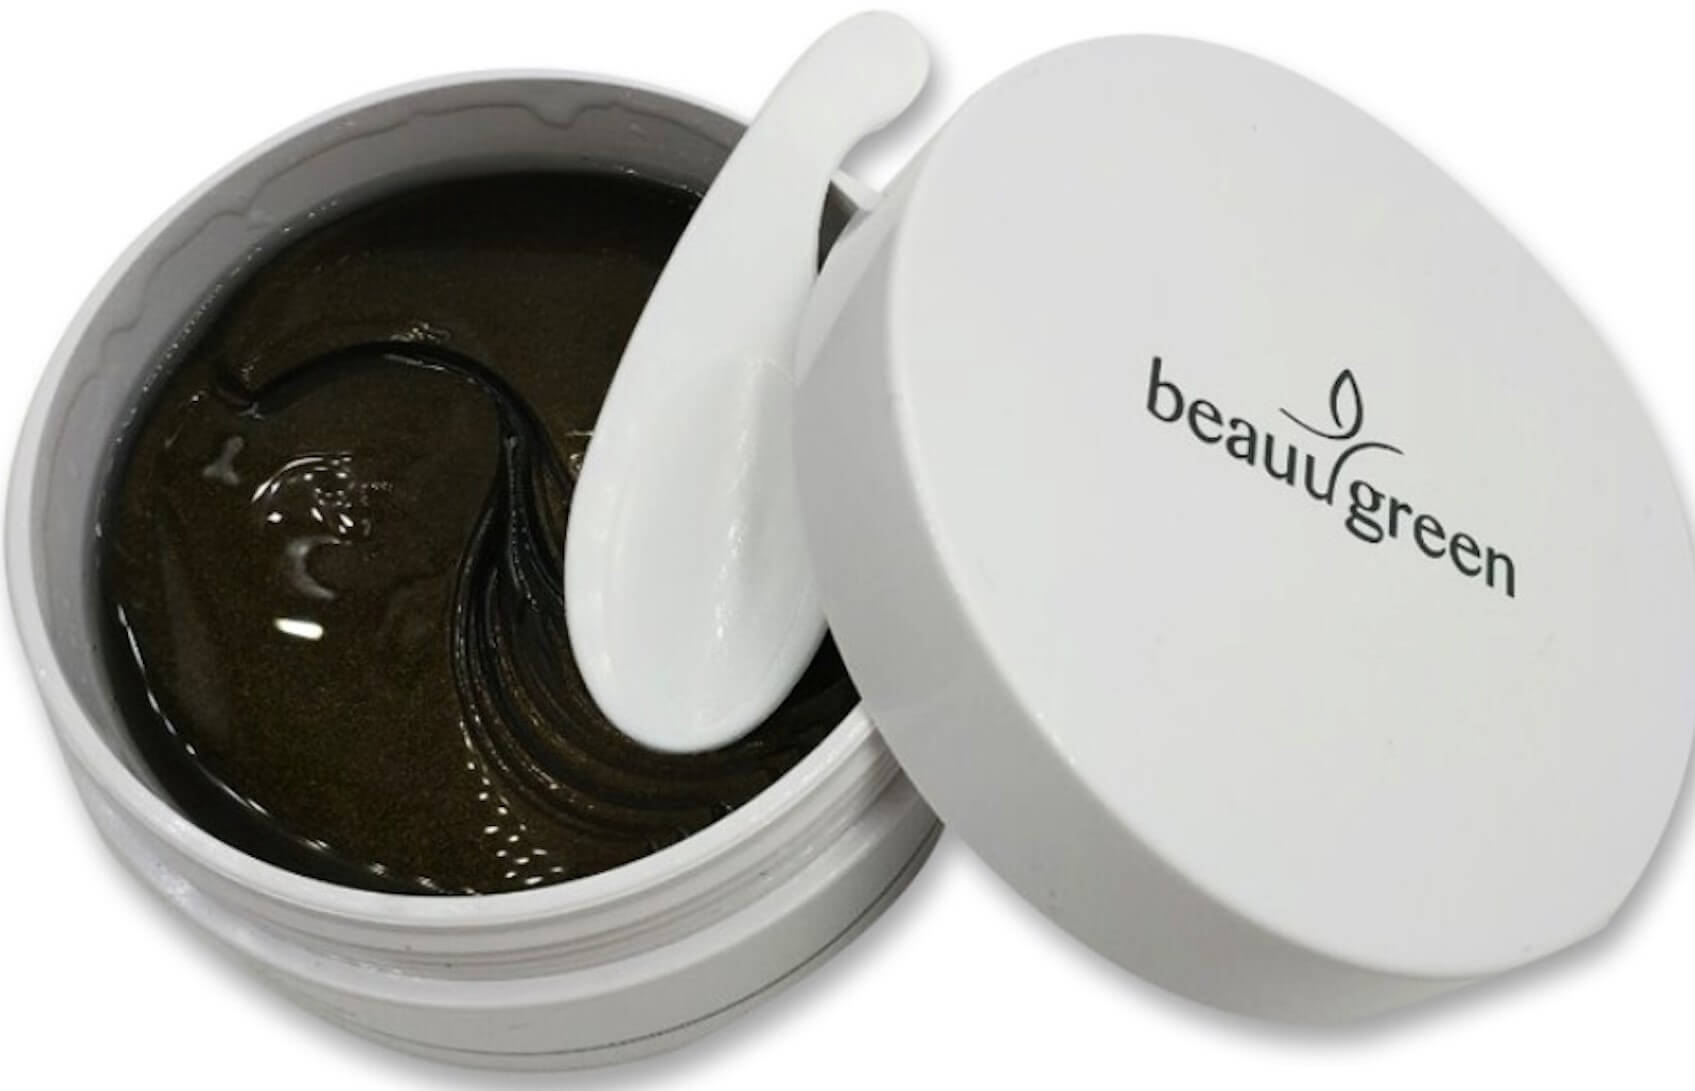 Beauugreen Hydrogel Sea Cucumber & Black